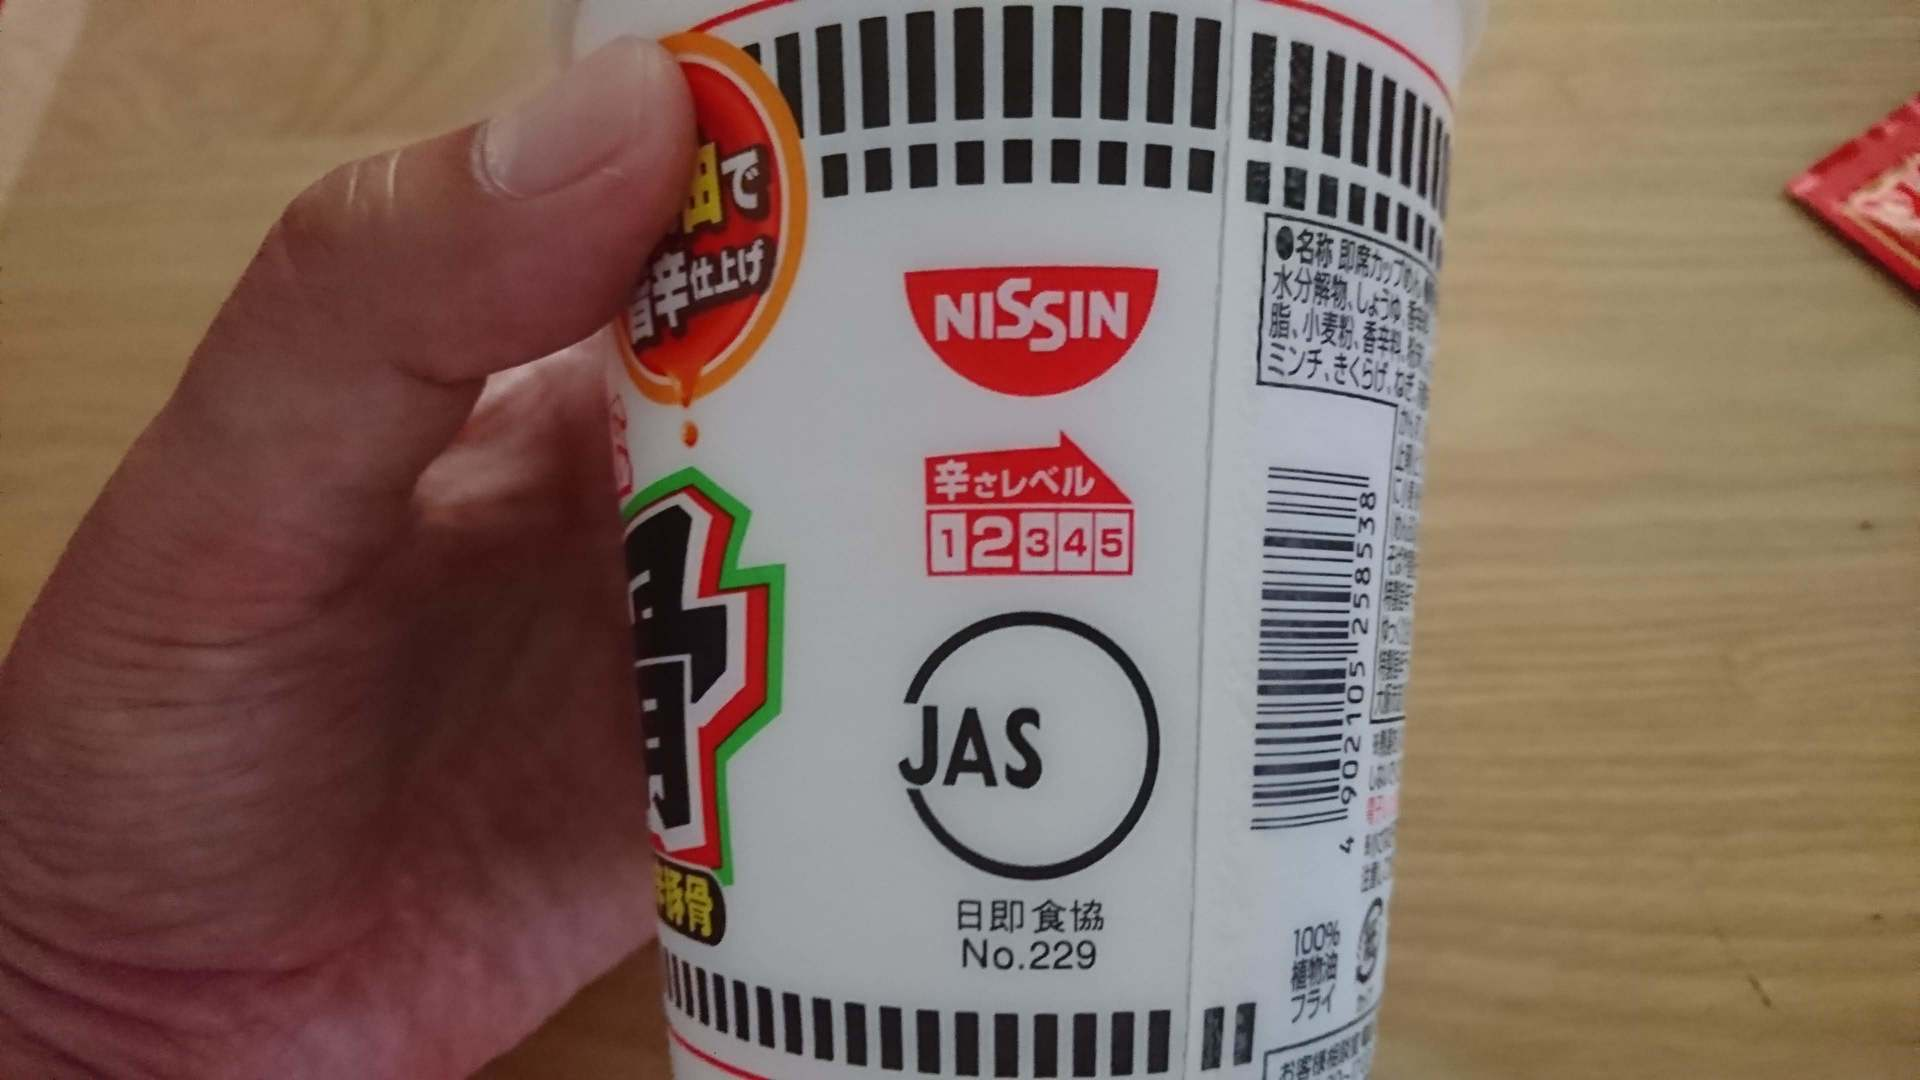 DSC_7664 (2).JPG